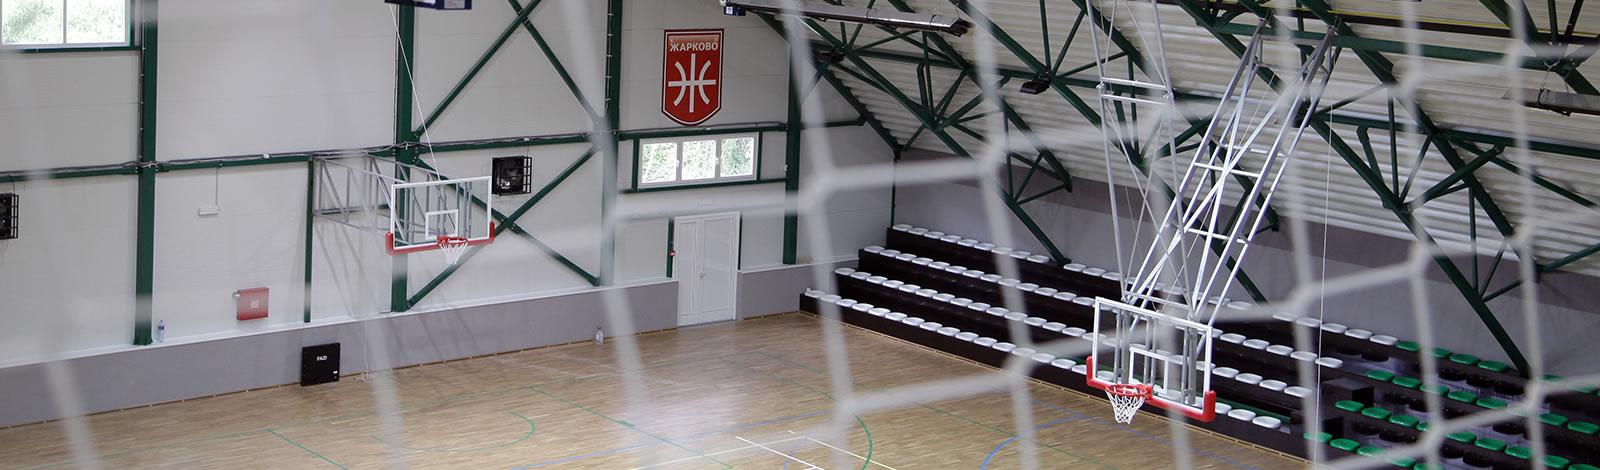 kk-zarkovo-slider-8